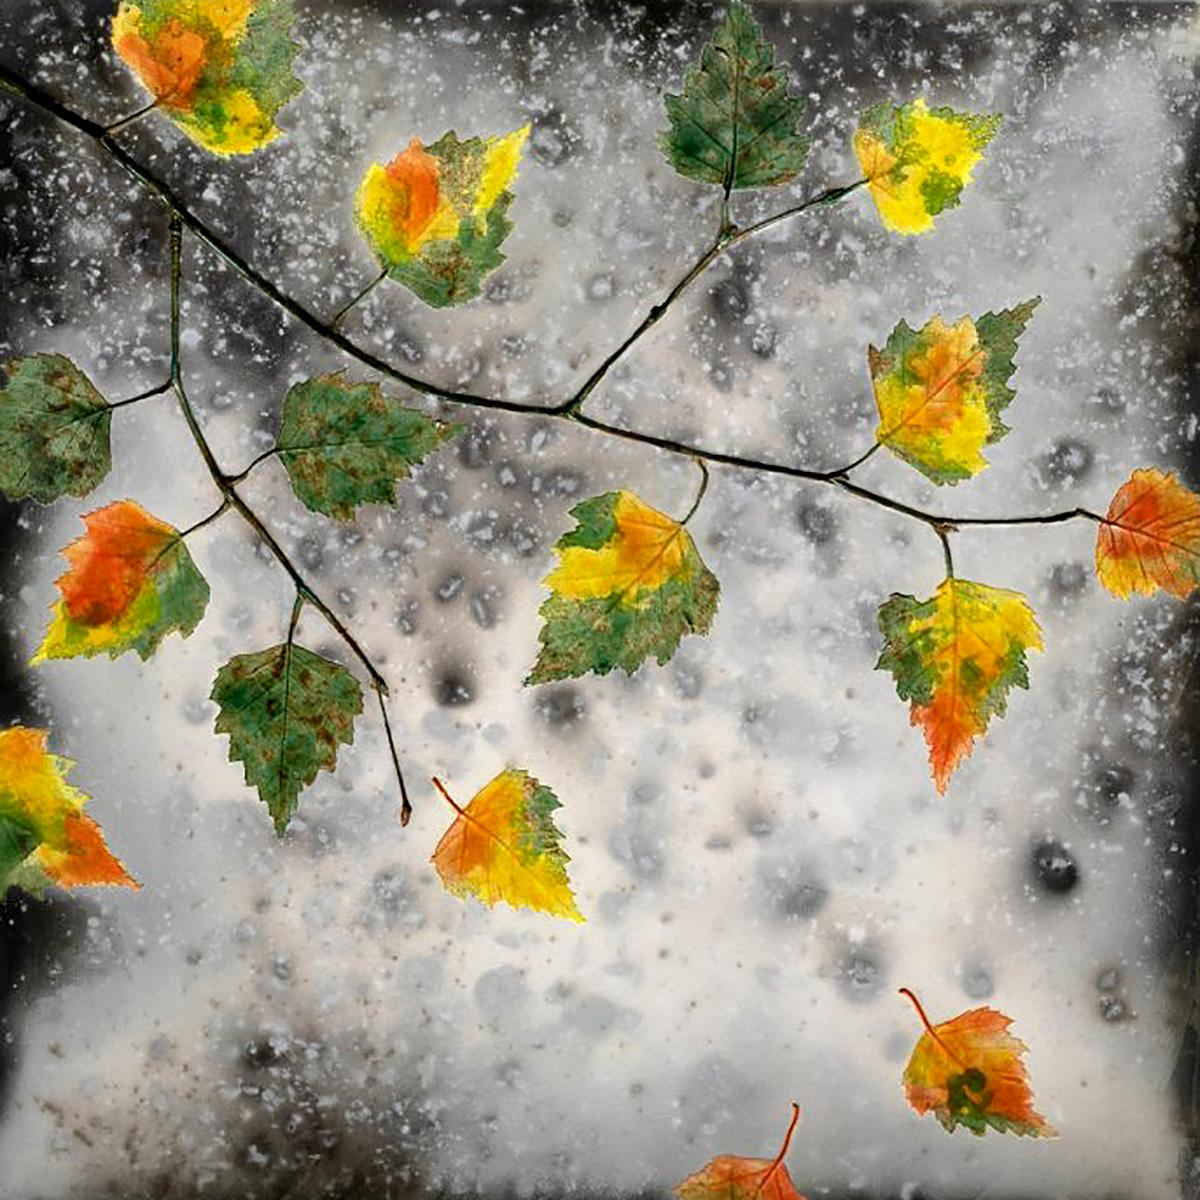 Helen Michie, 'Falling Autumn Birch III,' raku-fired ceramic wall piece